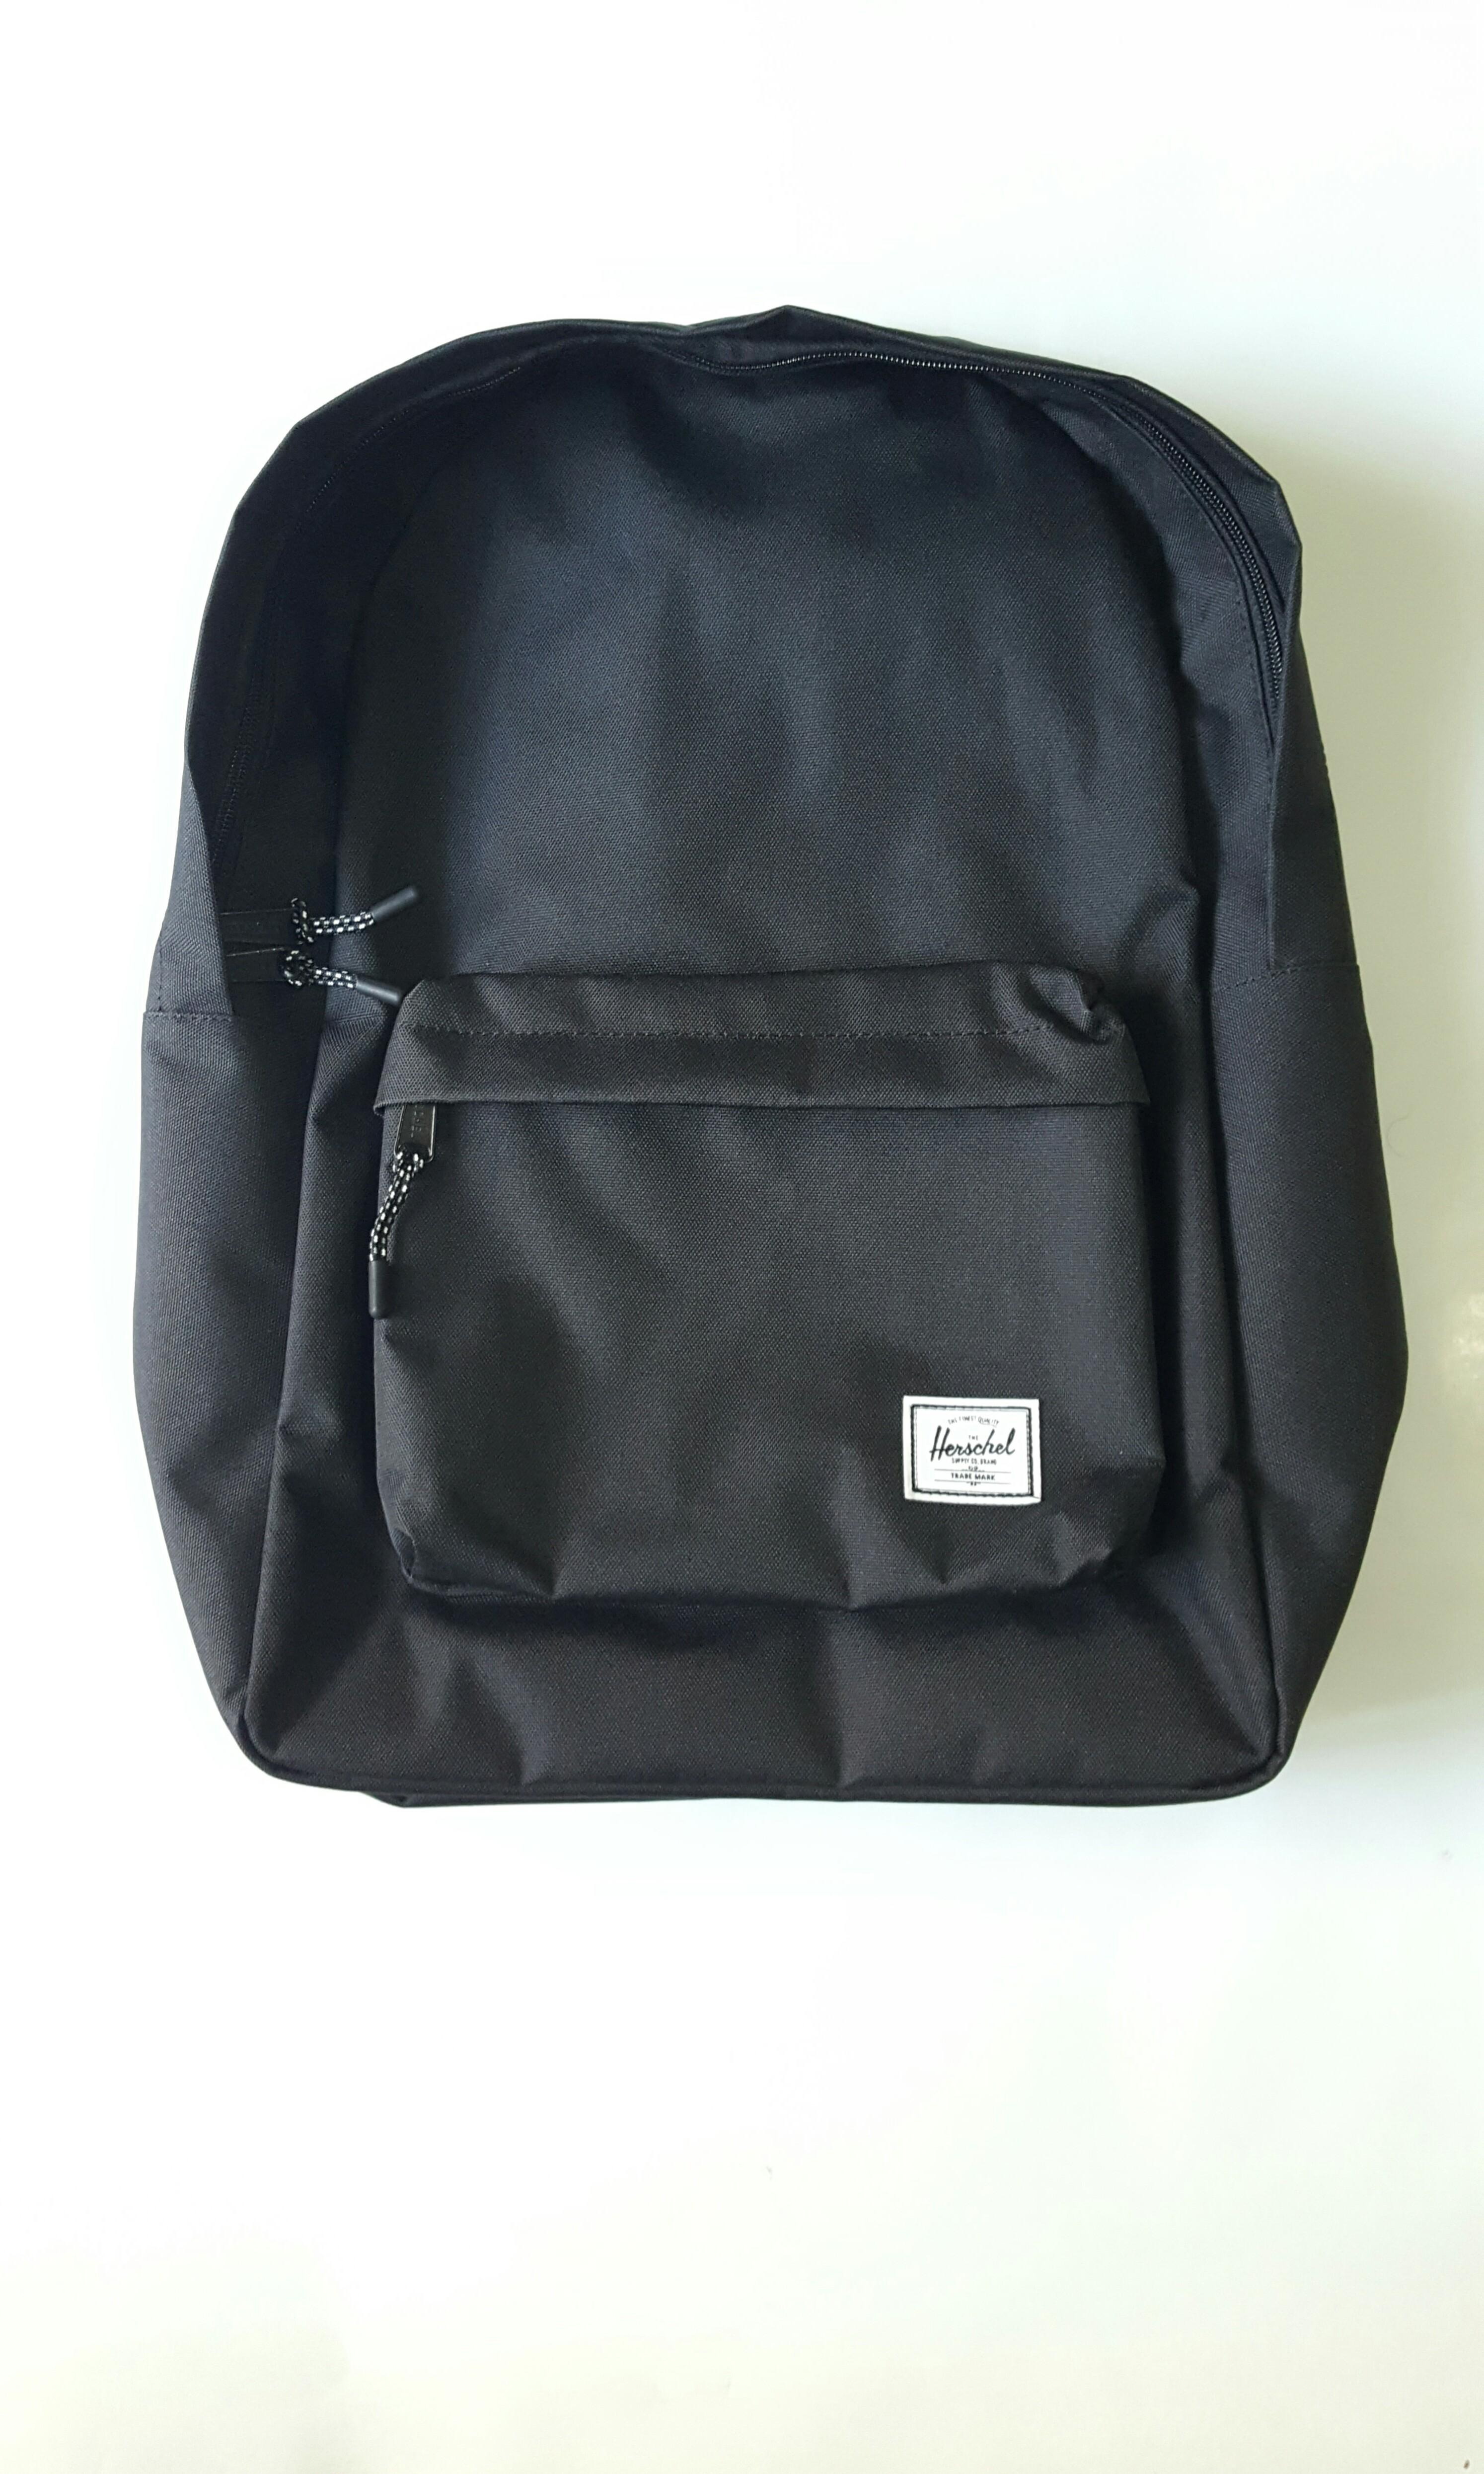 adfdfde0095 Herschel Classic Backpack 22L